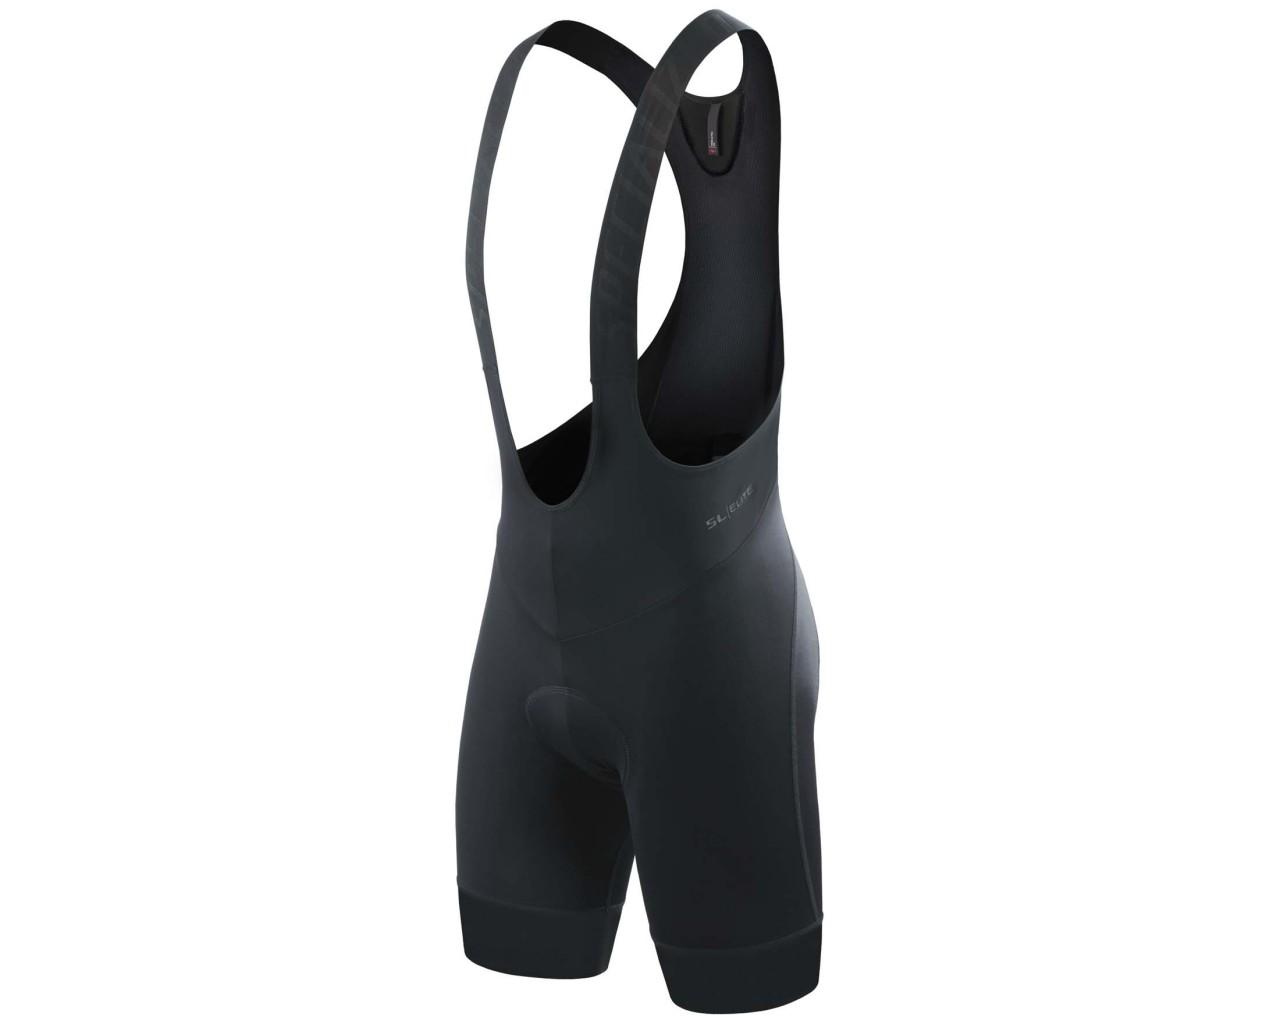 Specialized SL Elite Race Bib Shorts | black